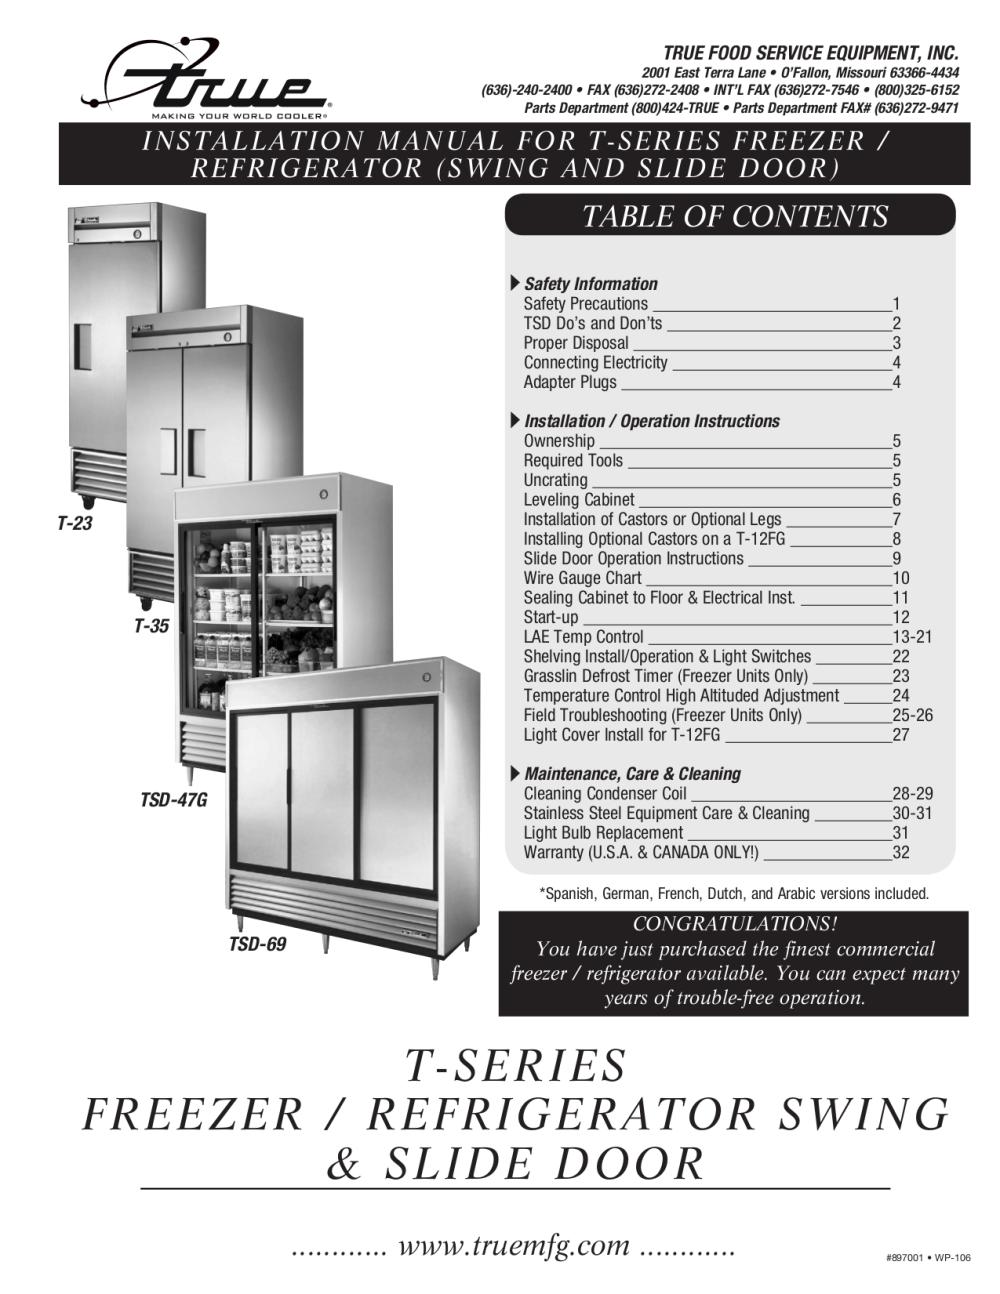 medium resolution of a true freezer wiring diagram for model t 35f wiring librarya true freezer wiring diagram for